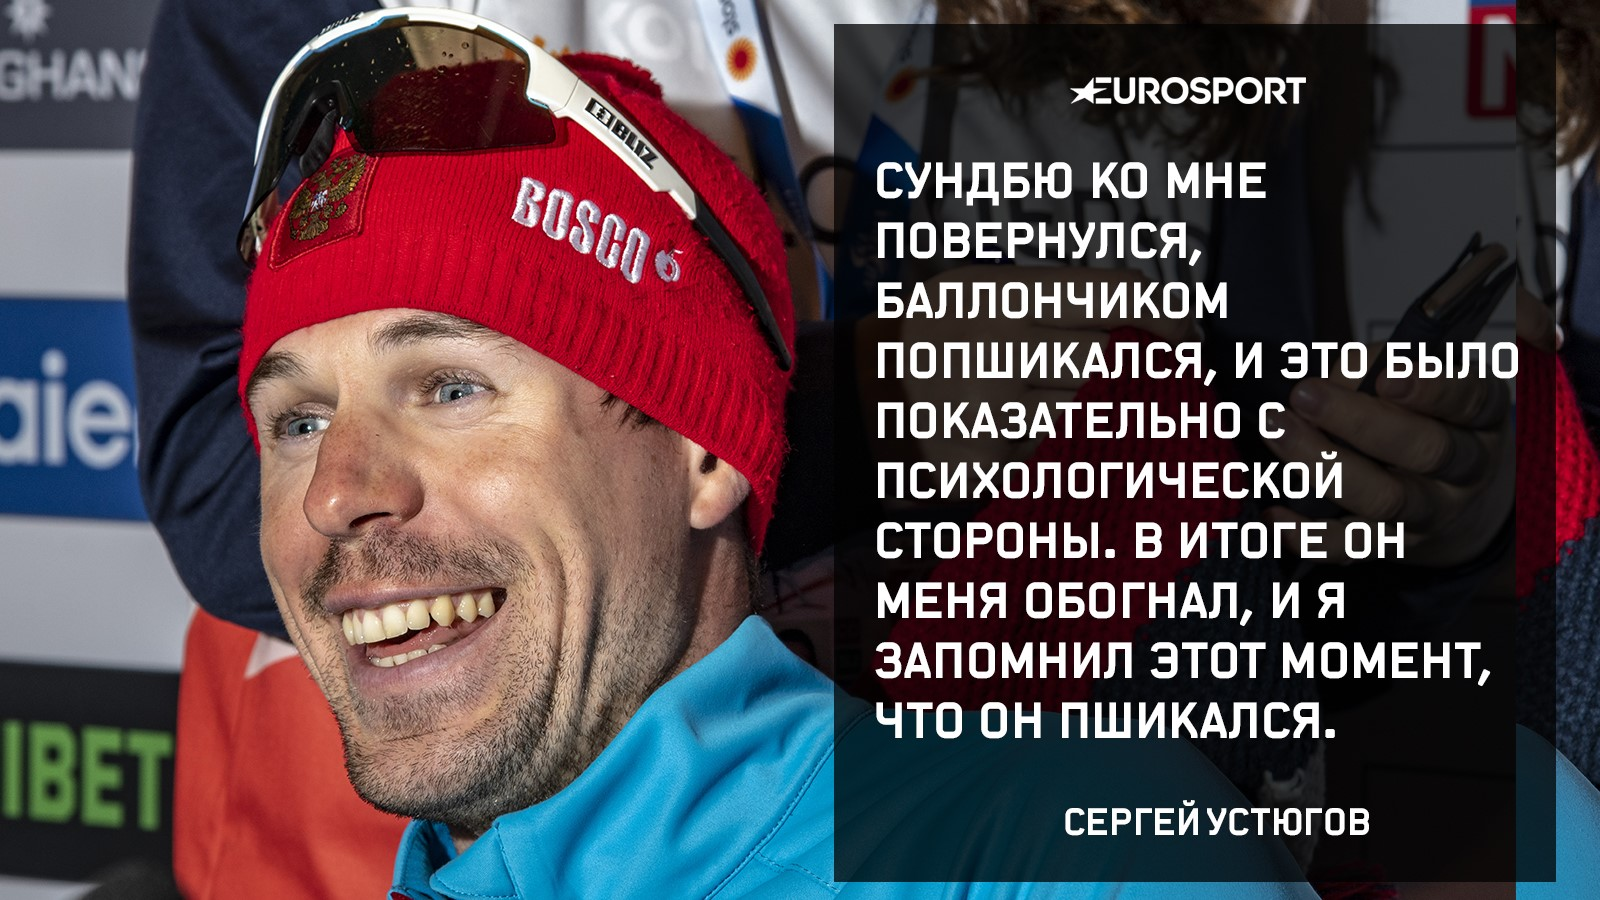 https://i.eurosport.com/2019/11/05/2710582.jpg